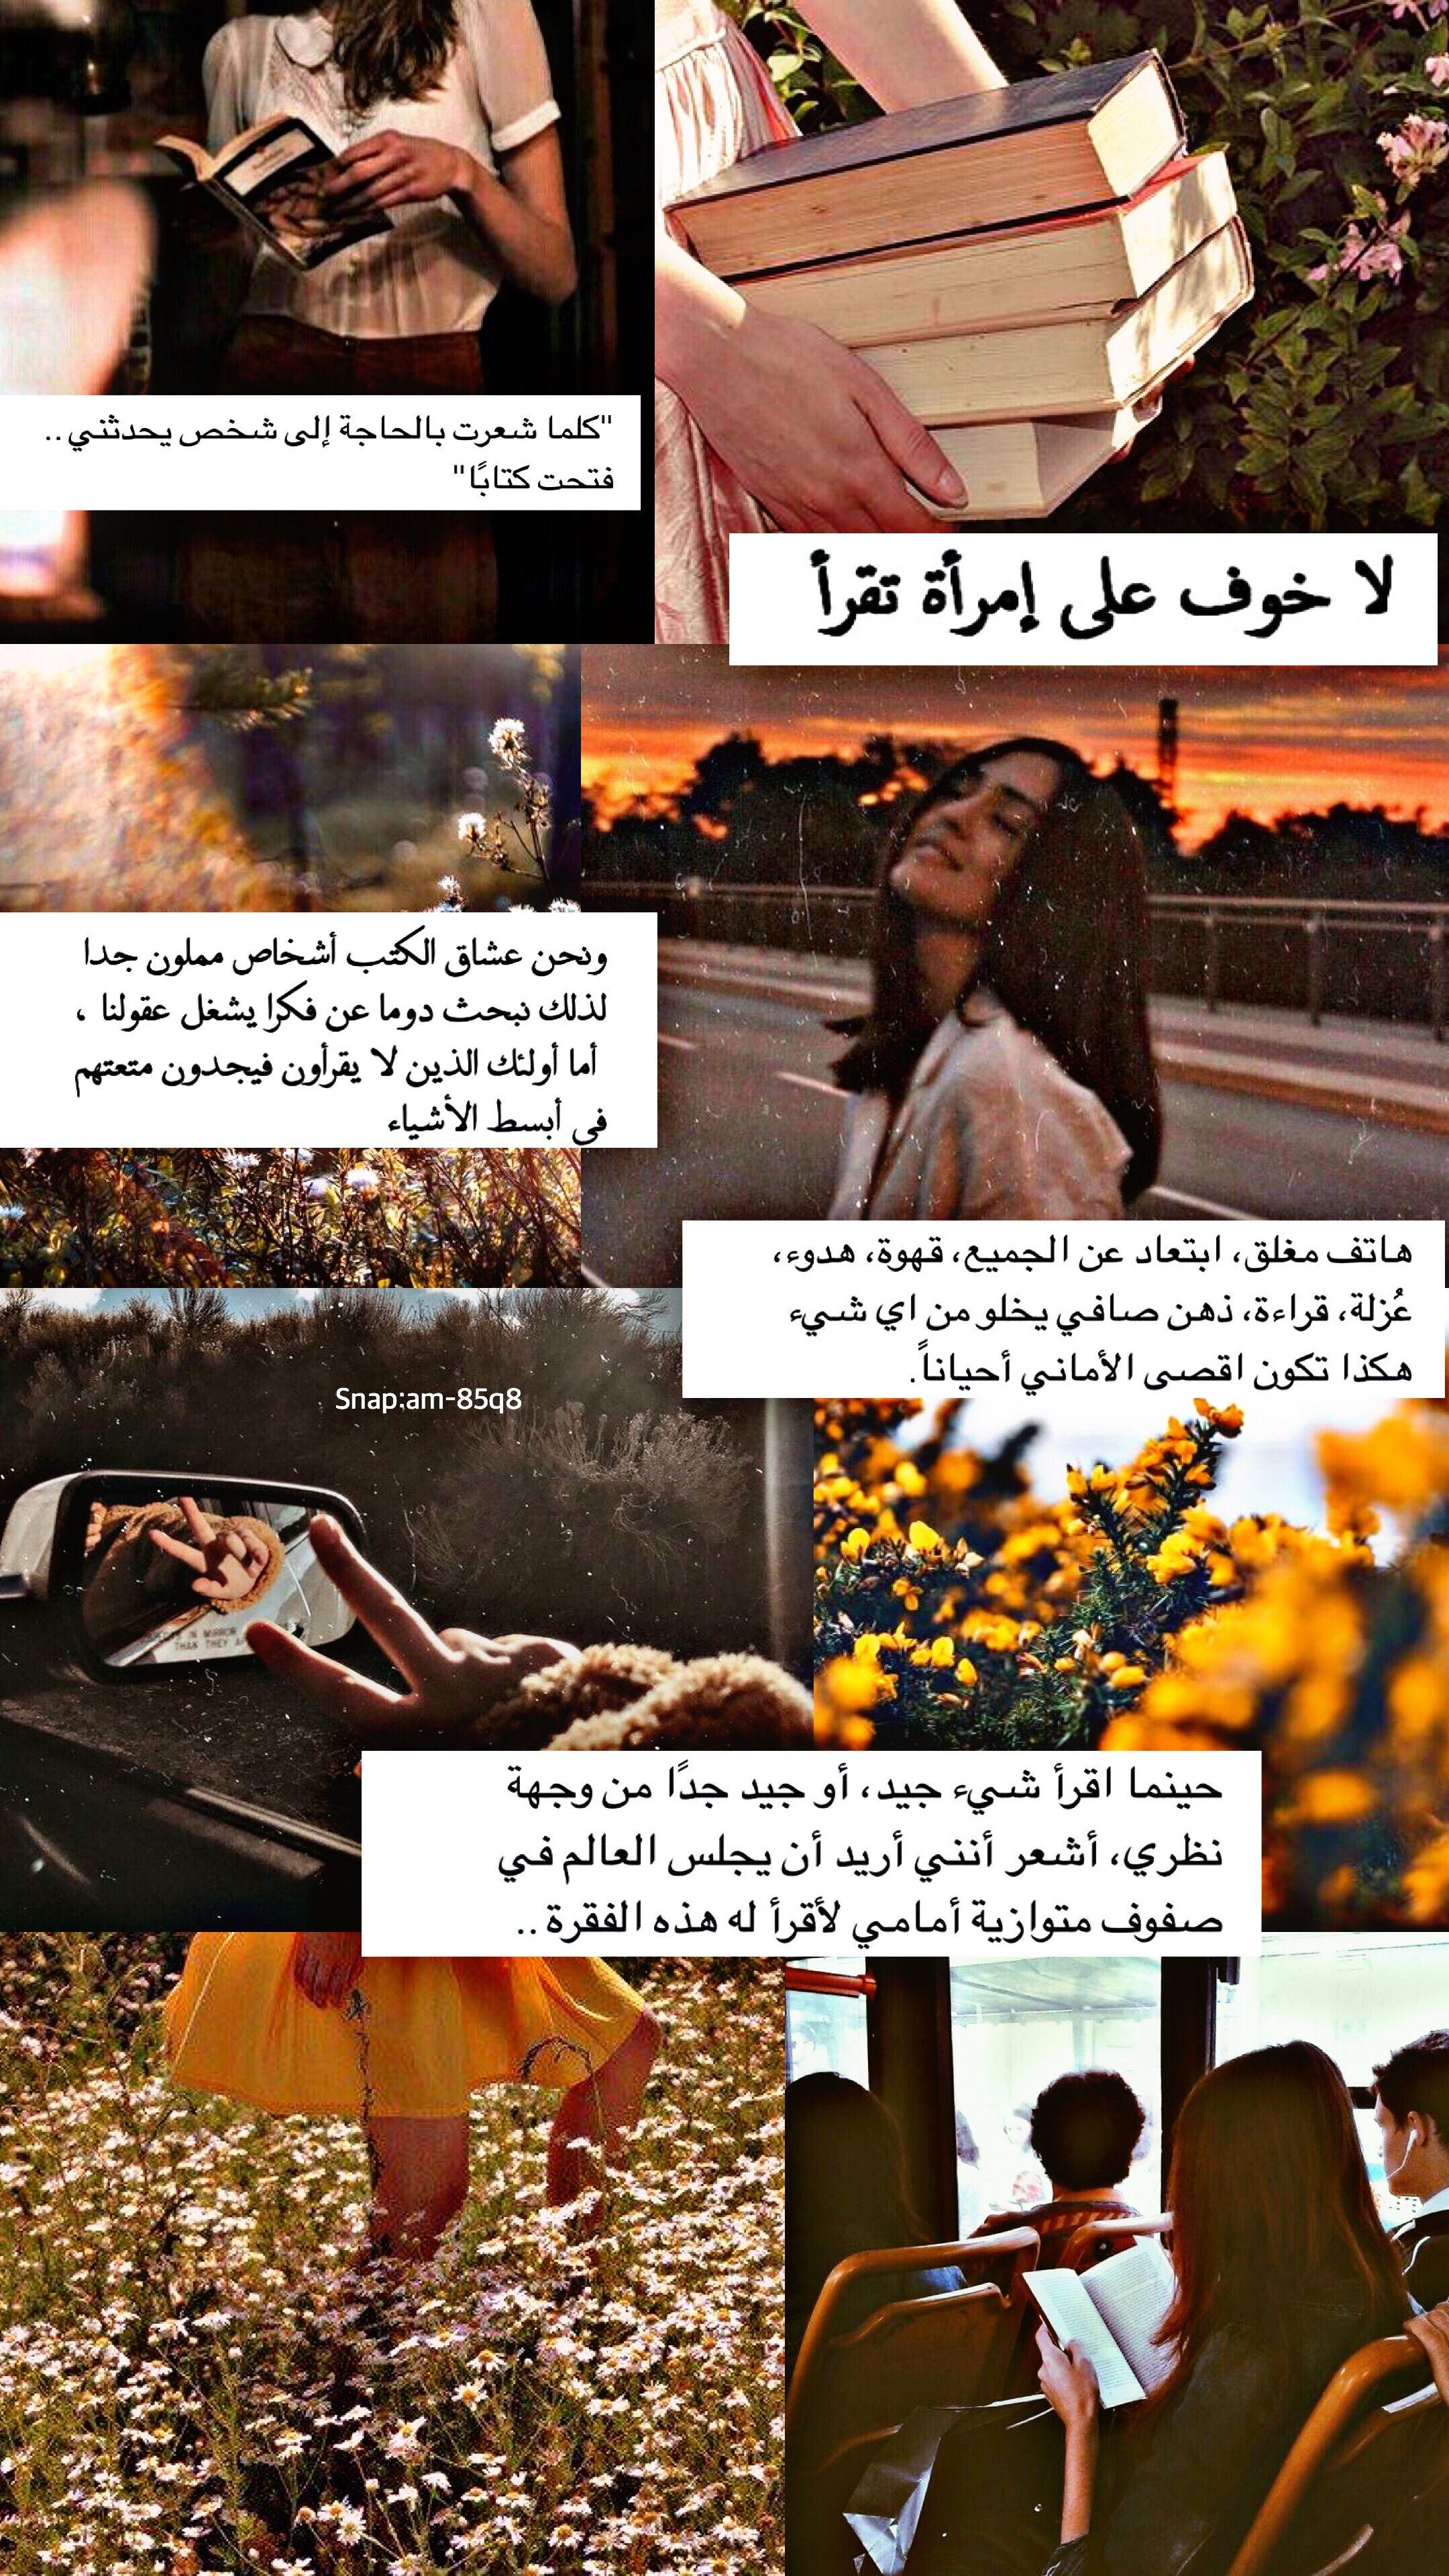 مـرحباا من فضلك עتـࢪى الصورﮪ وترحل Love Smile Quotes Beautiful Arabic Words Love Quotes Wallpaper